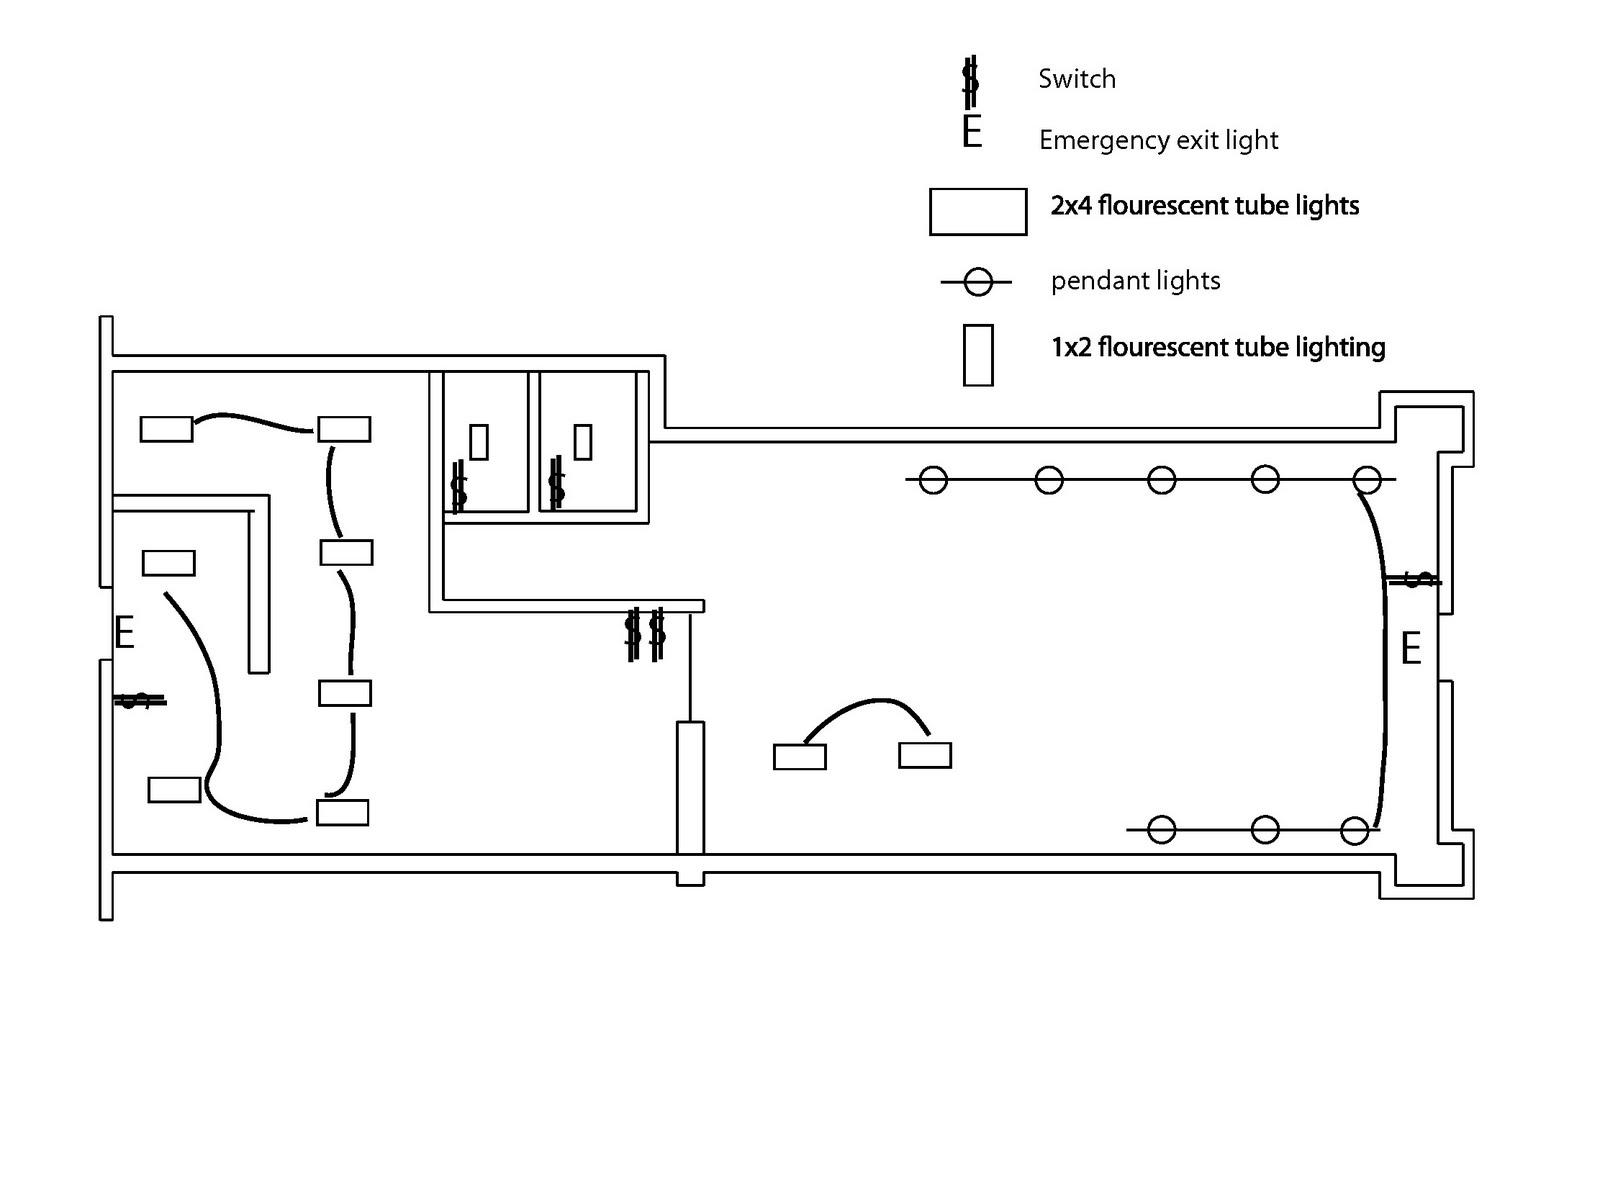 1970 Dodge Dart Ignition Wiring Diagram Vt Radio Roadrunner Engine Imageresizertool Com